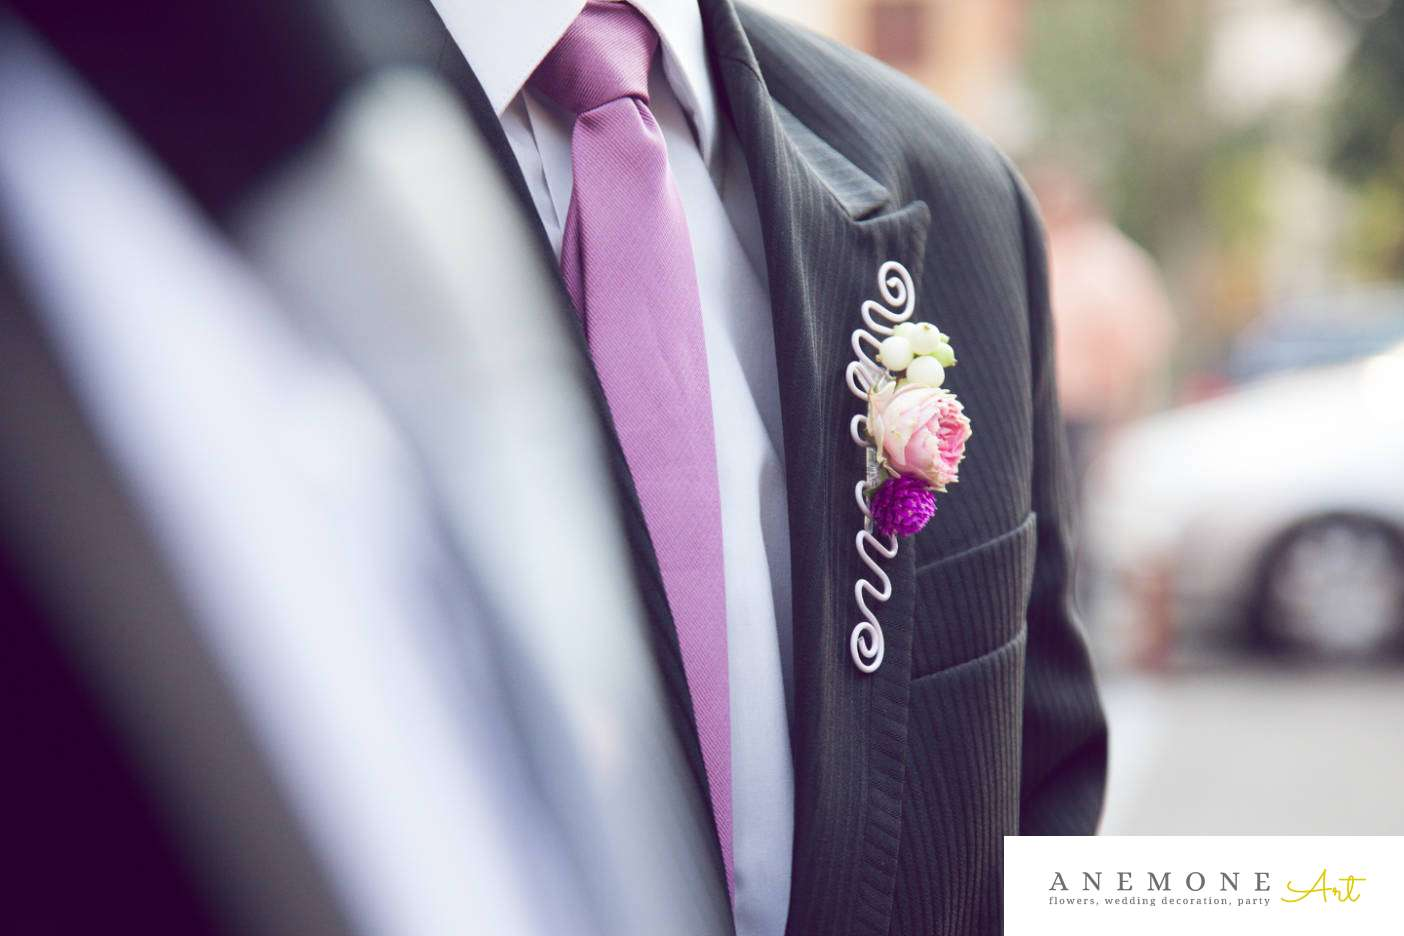 Poza, foto cu Flori de nunta butoniera, cocarda, mini-rosa, roz, ticlam, trandafiri englezesti in Arad, Timisoara, Oradea (wedding flowers, bouquets) nunta Arad, Timisoara, Oradea